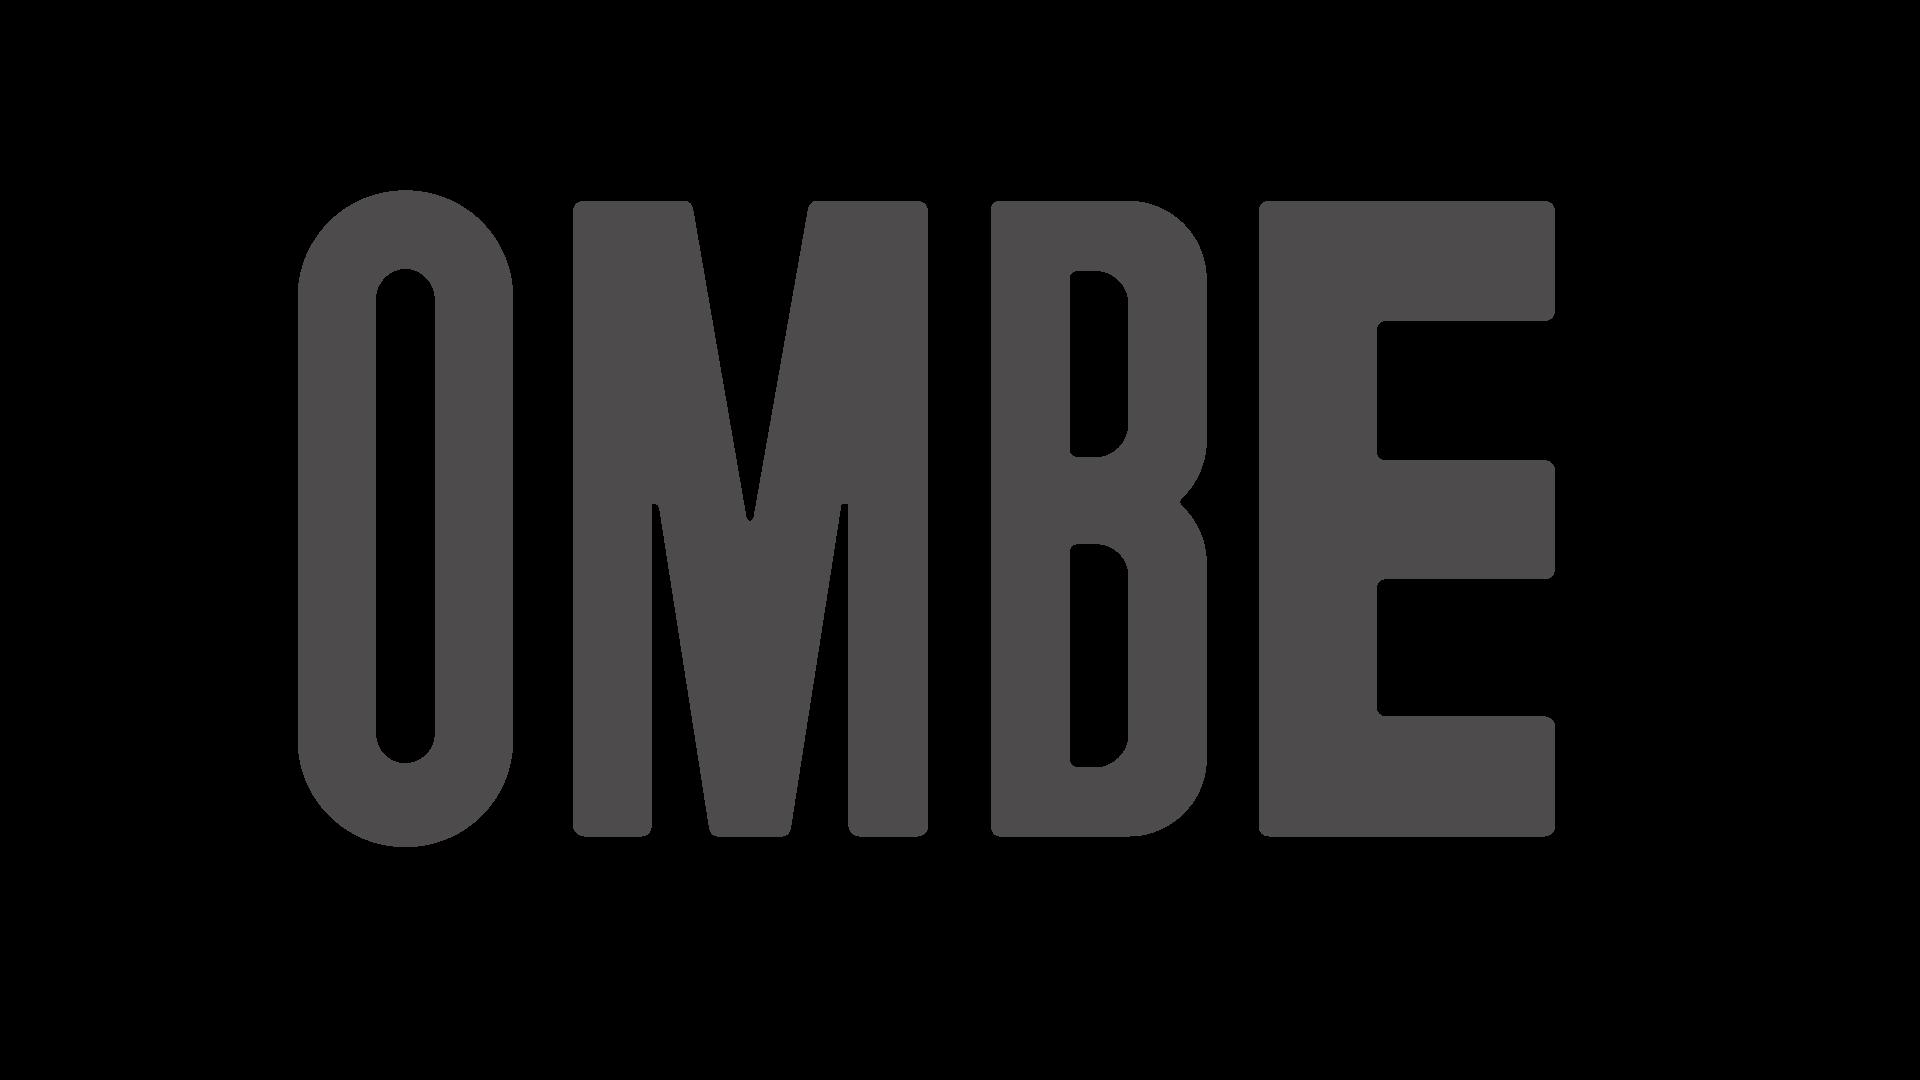 Ombe Surf logo